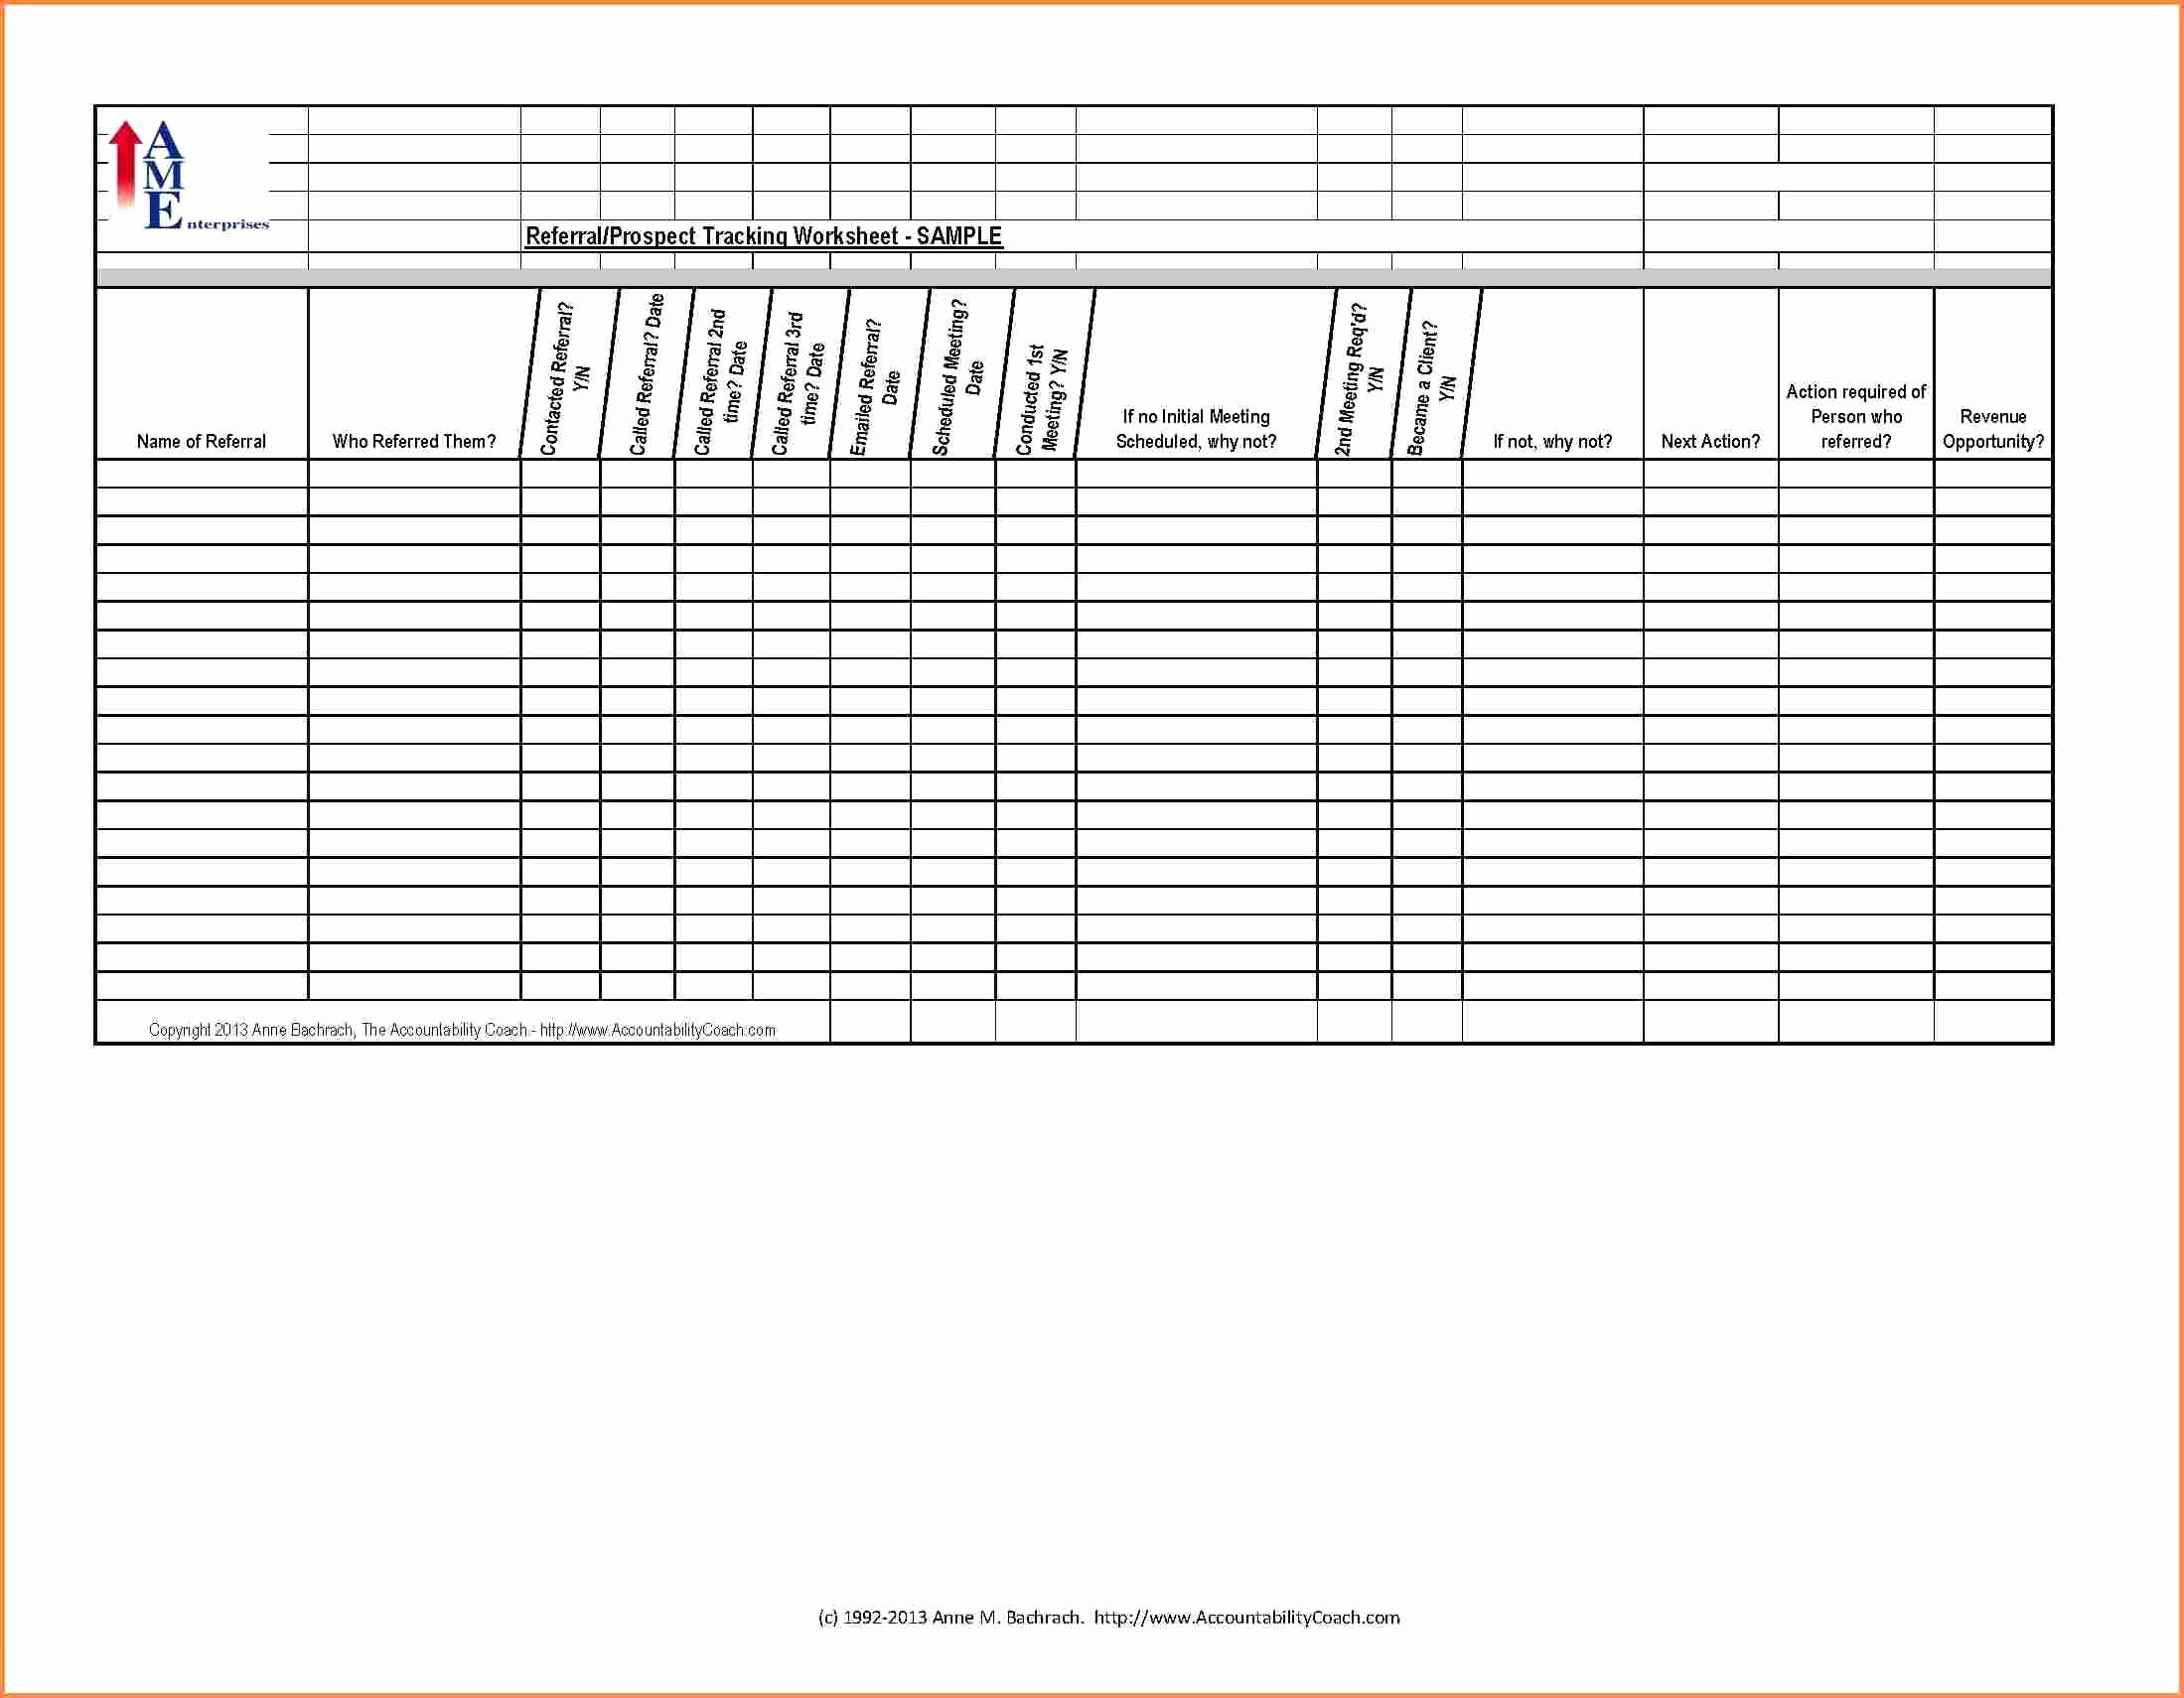 Vending Machine Inventory Spreadsheet Elegant 50 Beautiful Vending Within Vending Machine Inventory Spreadsheet